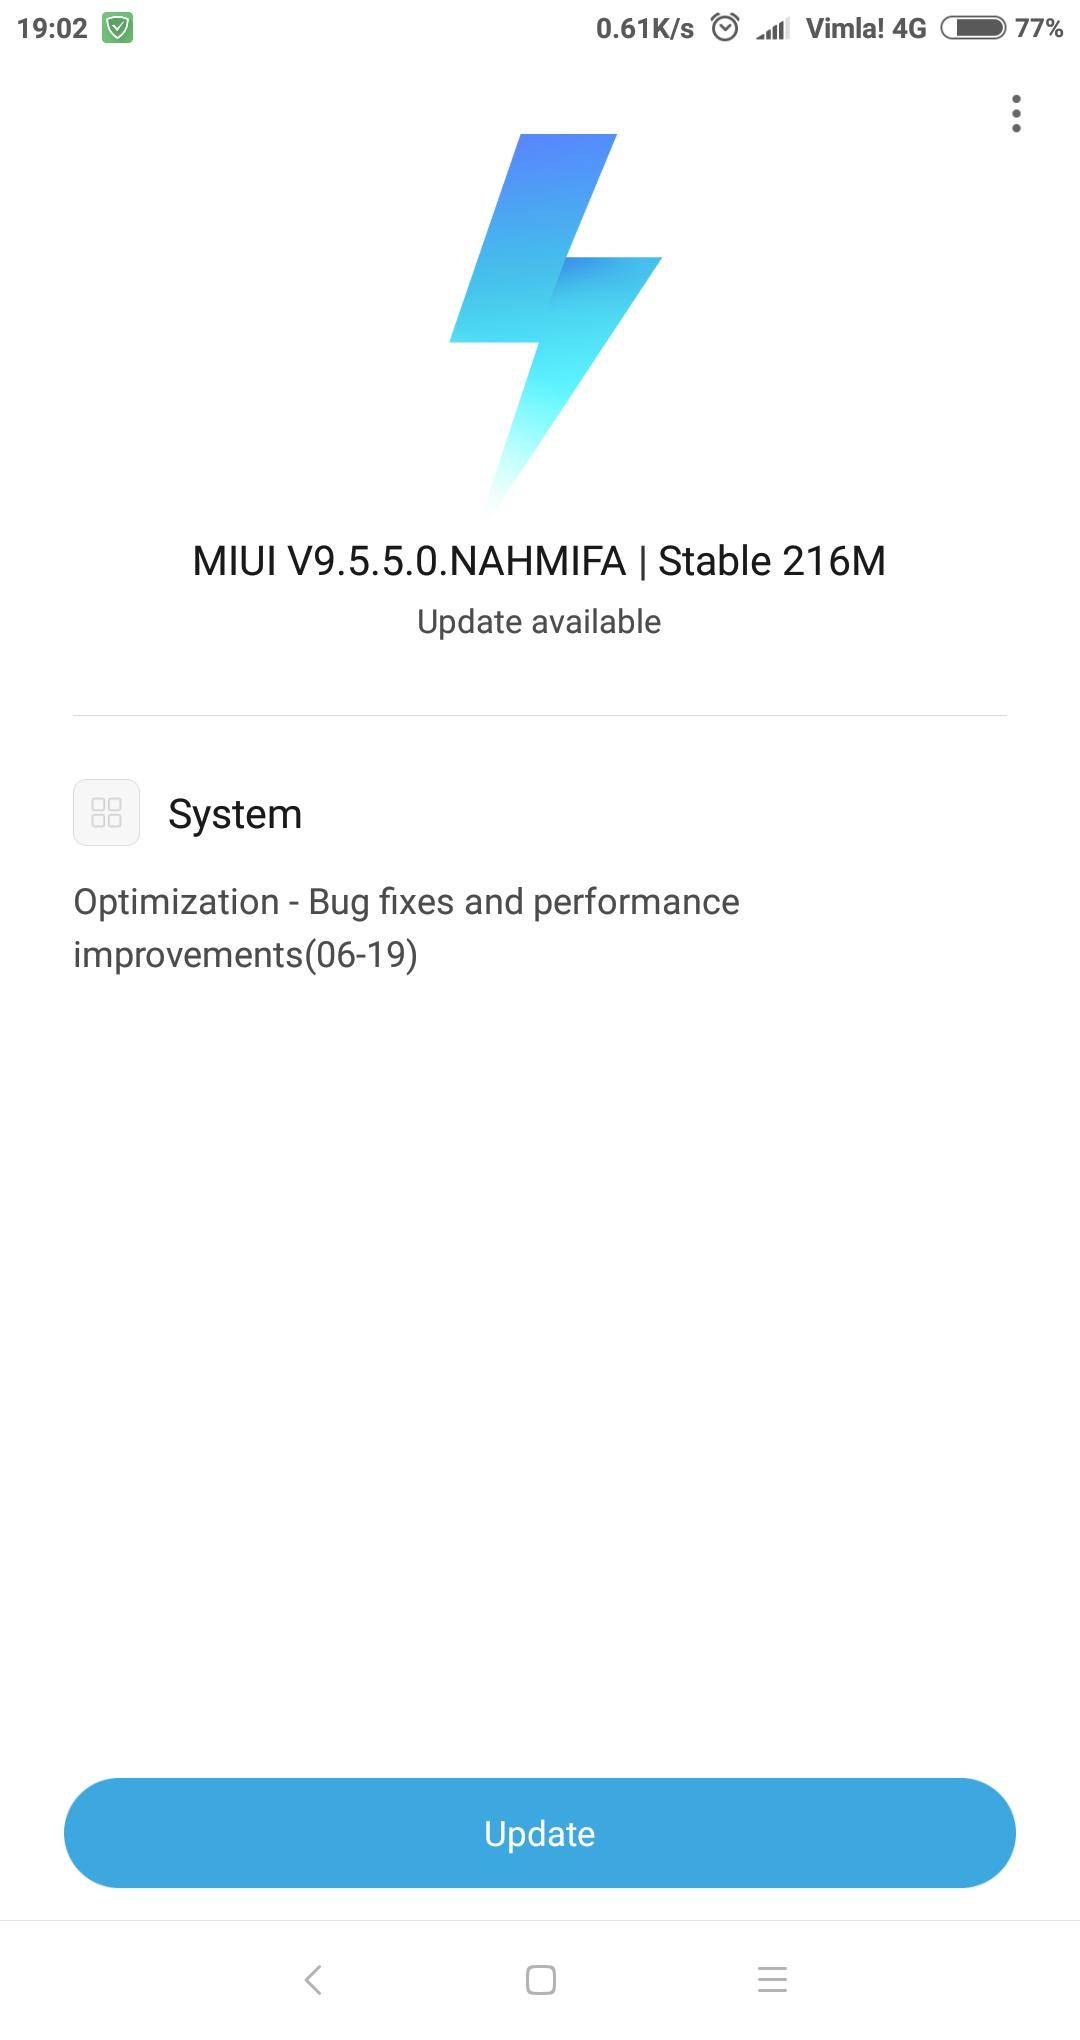 Screenshot_2018-06-27-19-02-11-030_com.android.updater.png